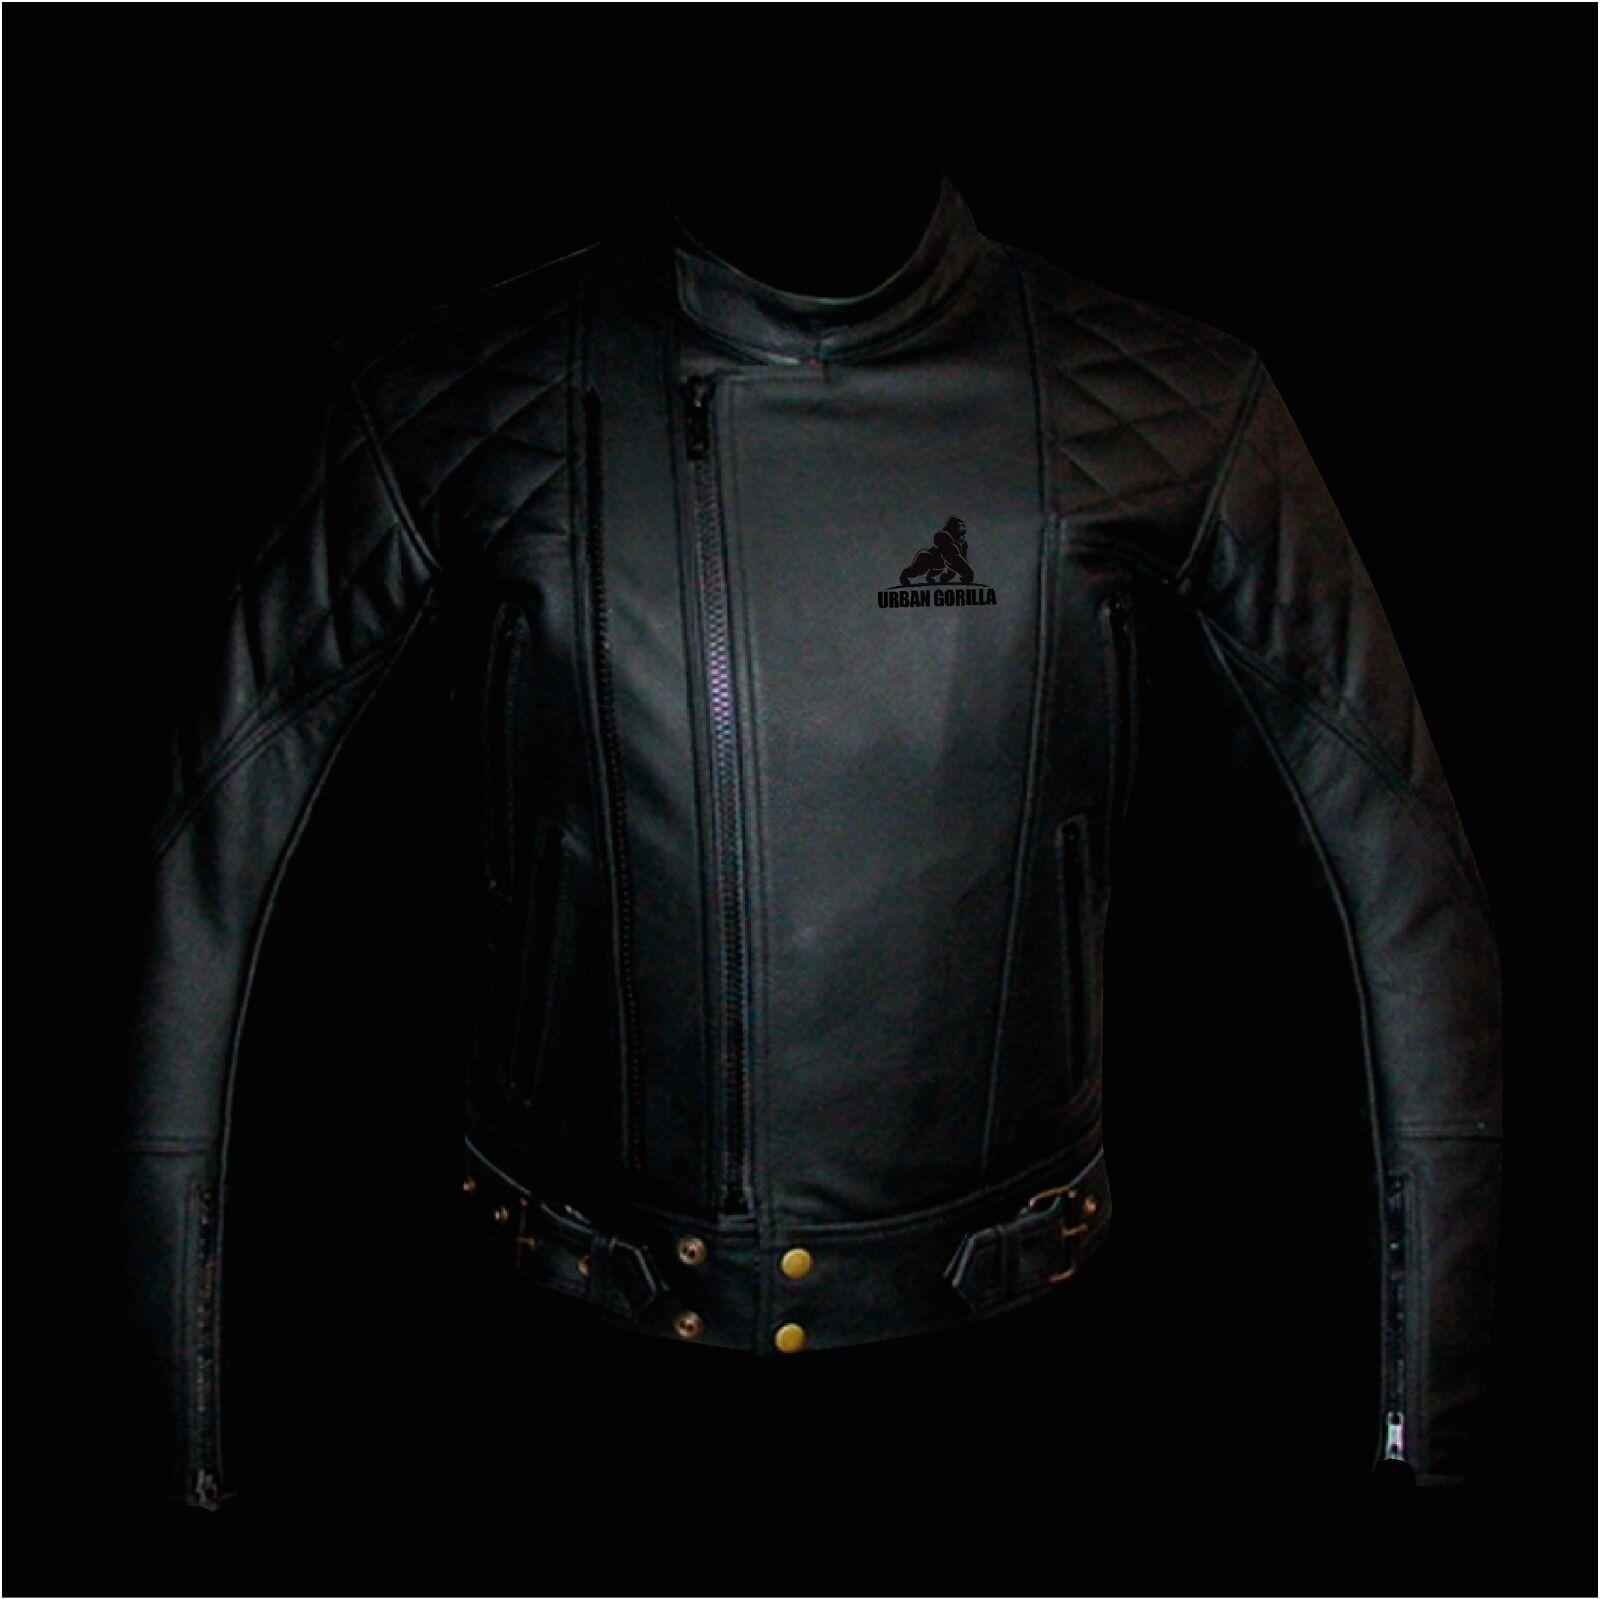 Urban Gorilla Jacket